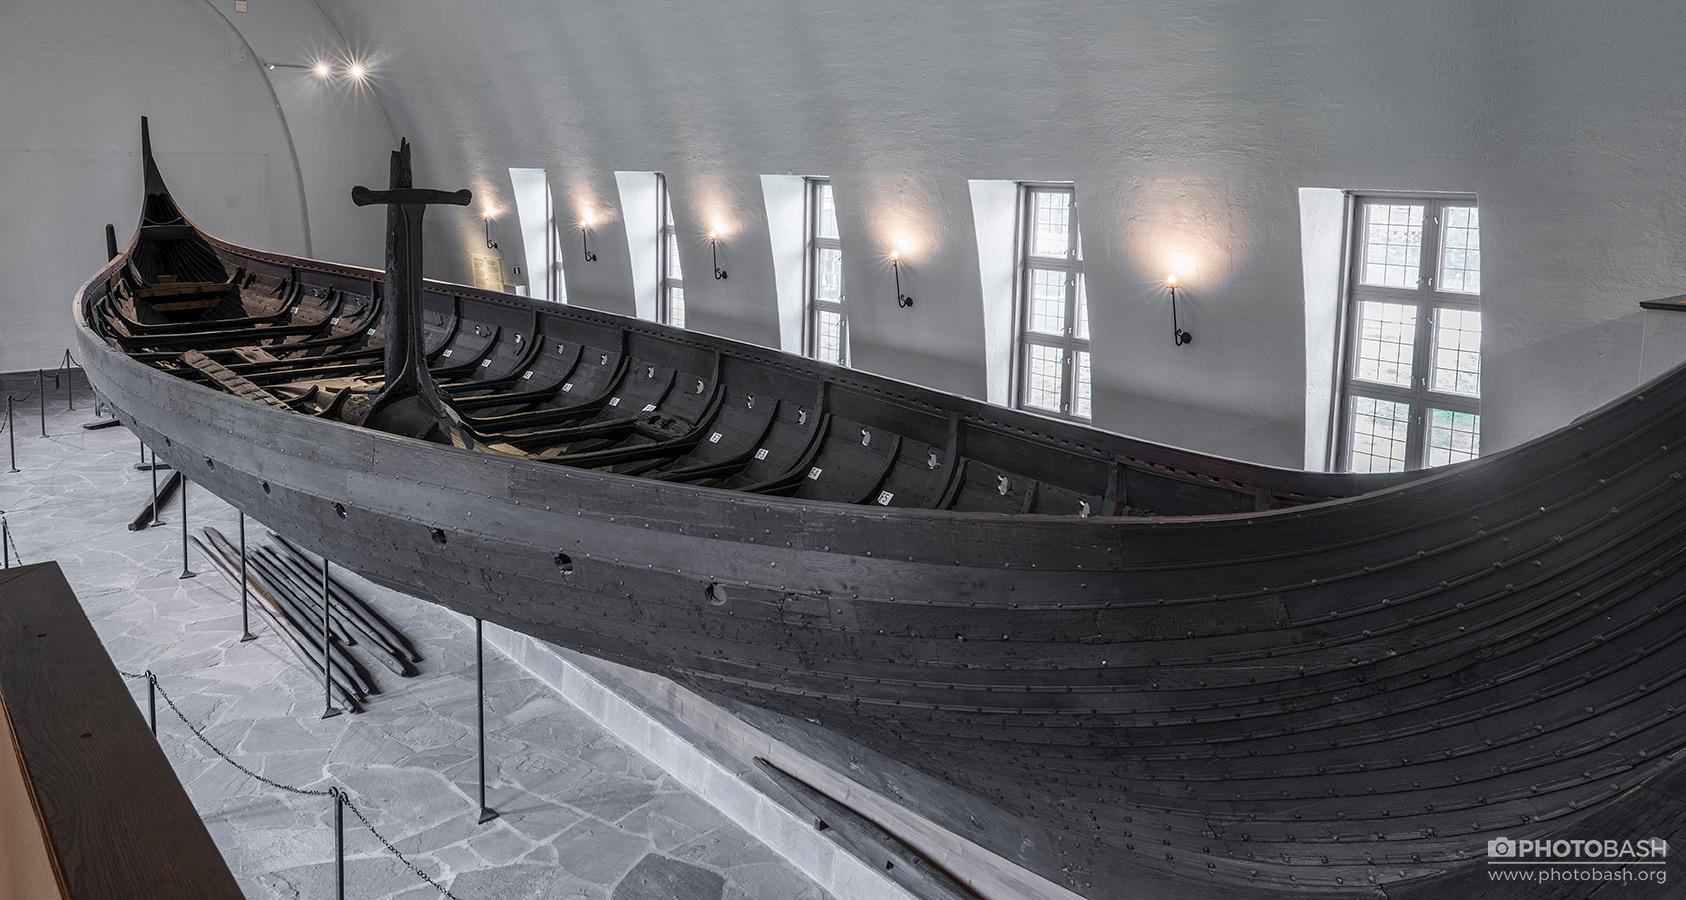 Viking-Artifacts-Norse-Boat.jpg